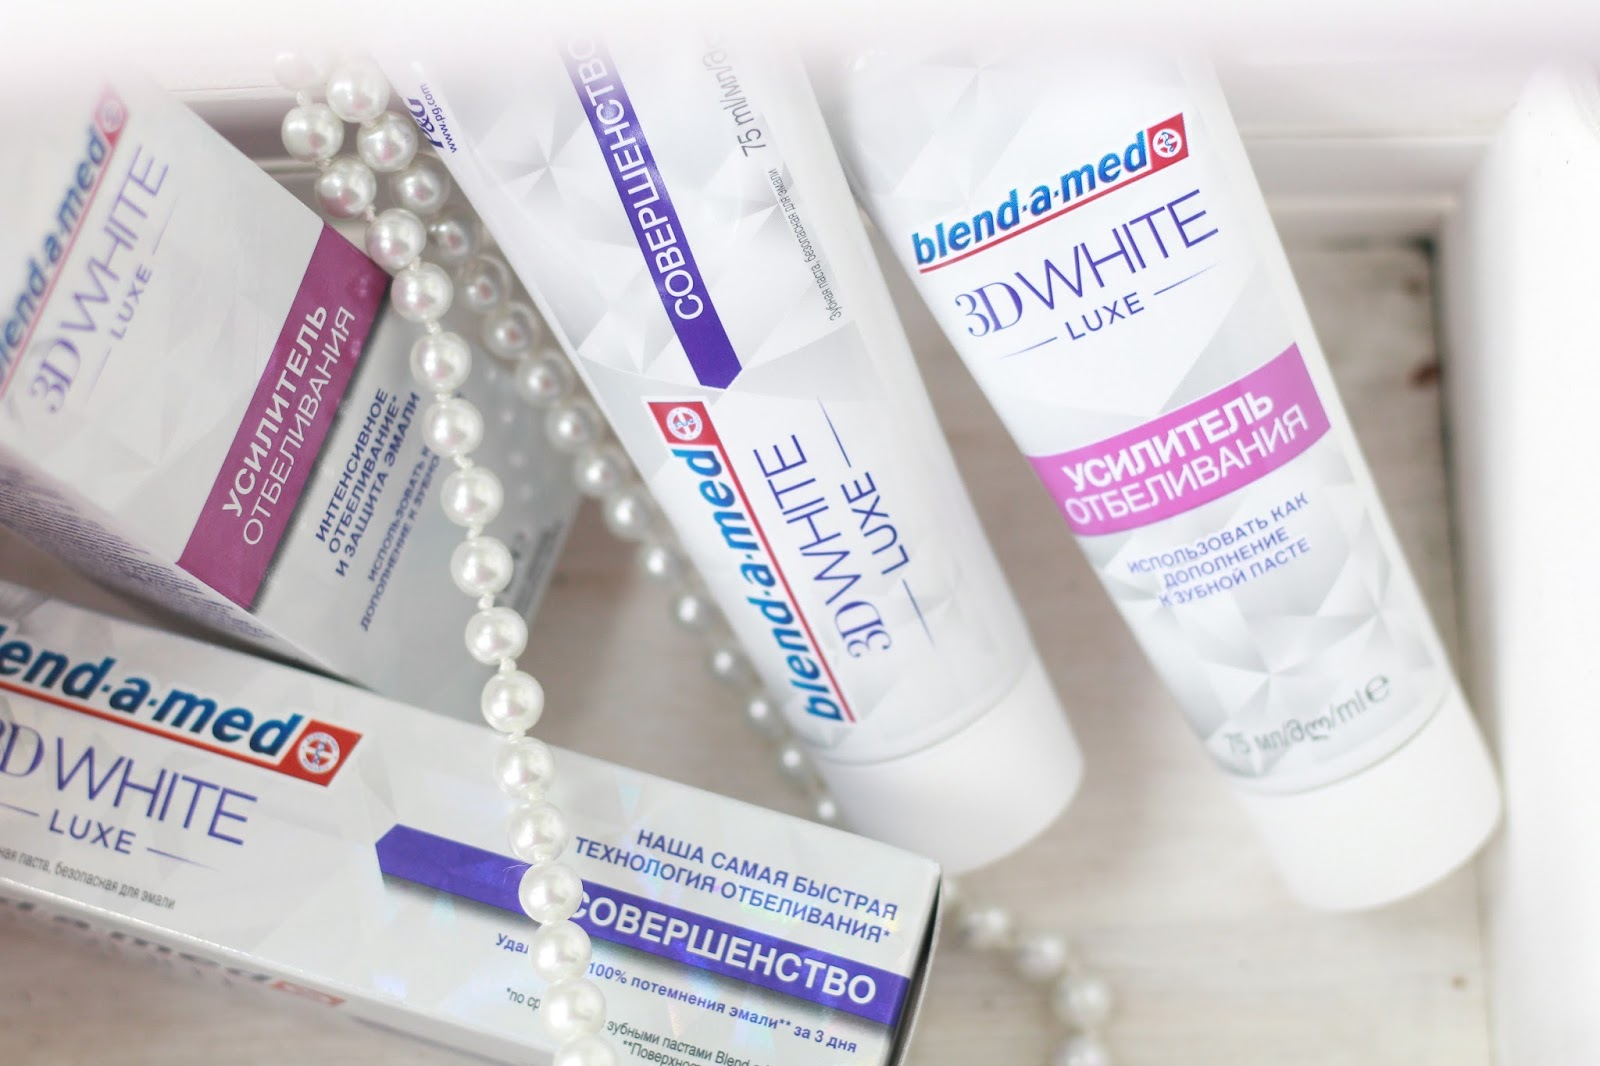 Бьюти-новинка недели: Blend a-med 3D White Luxe Гламур изоражения